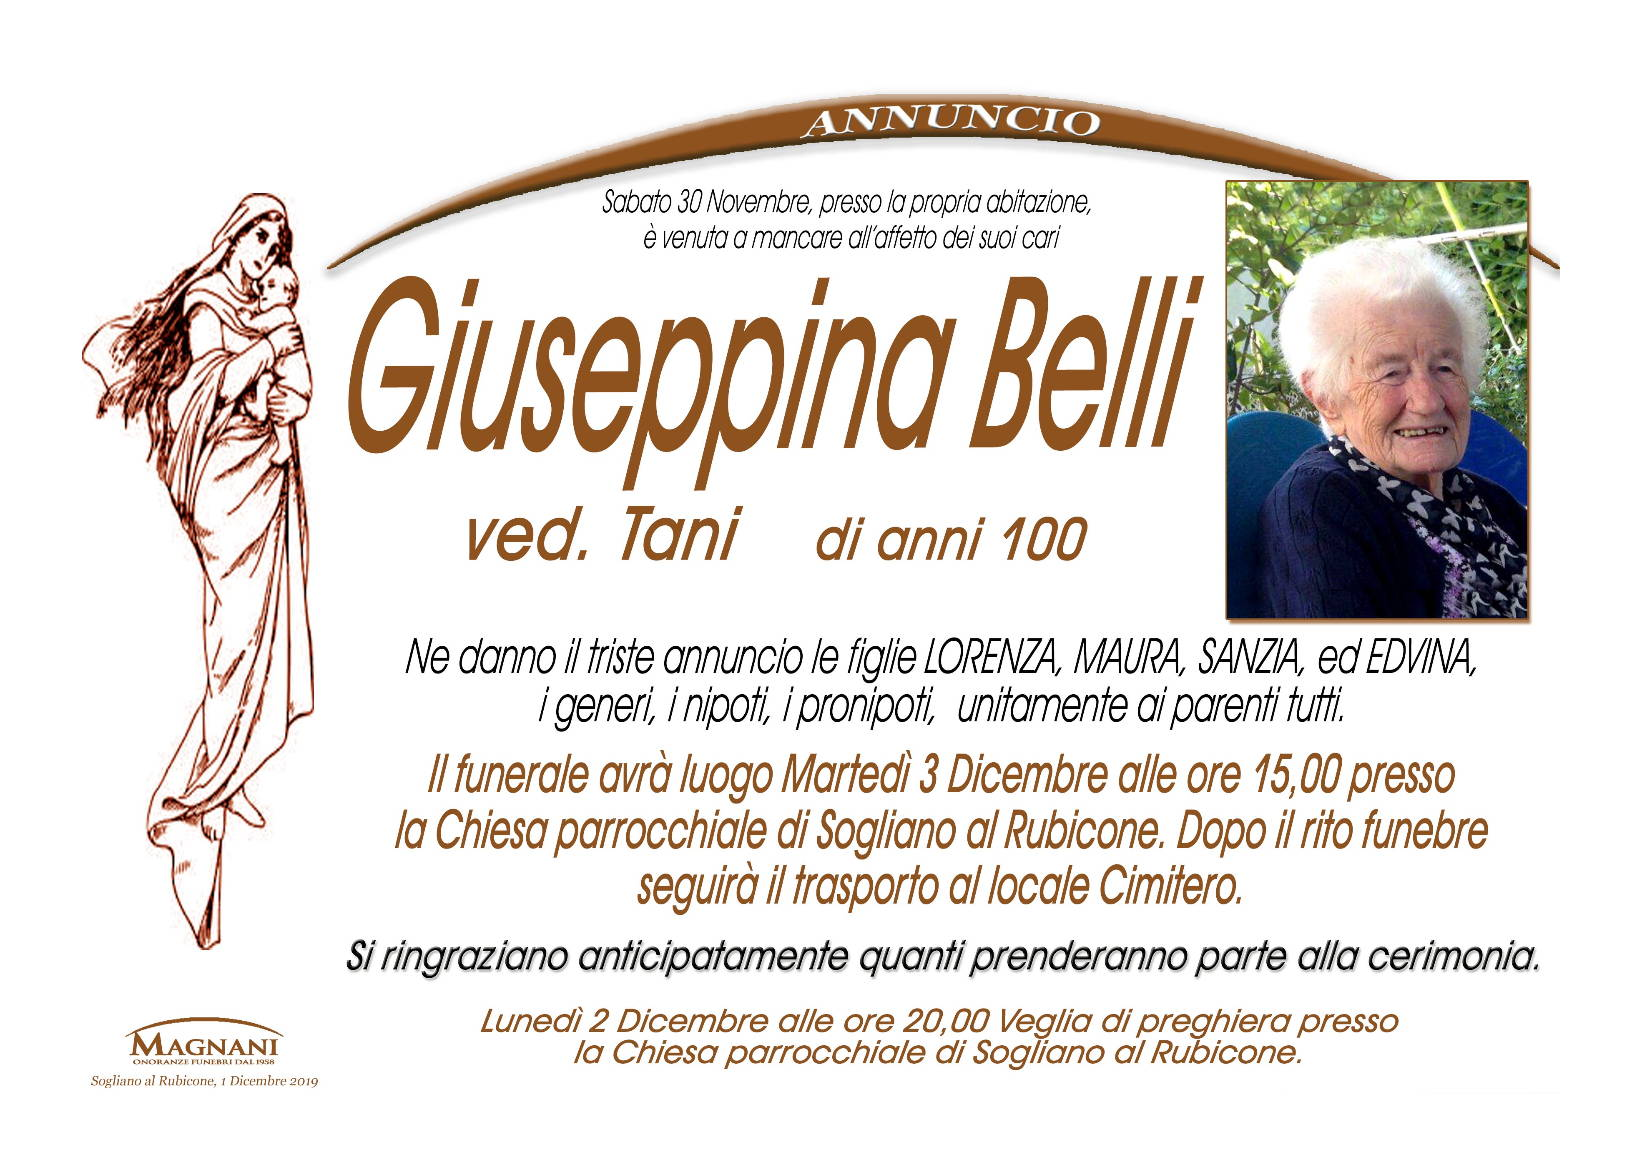 Giuseppina Belli